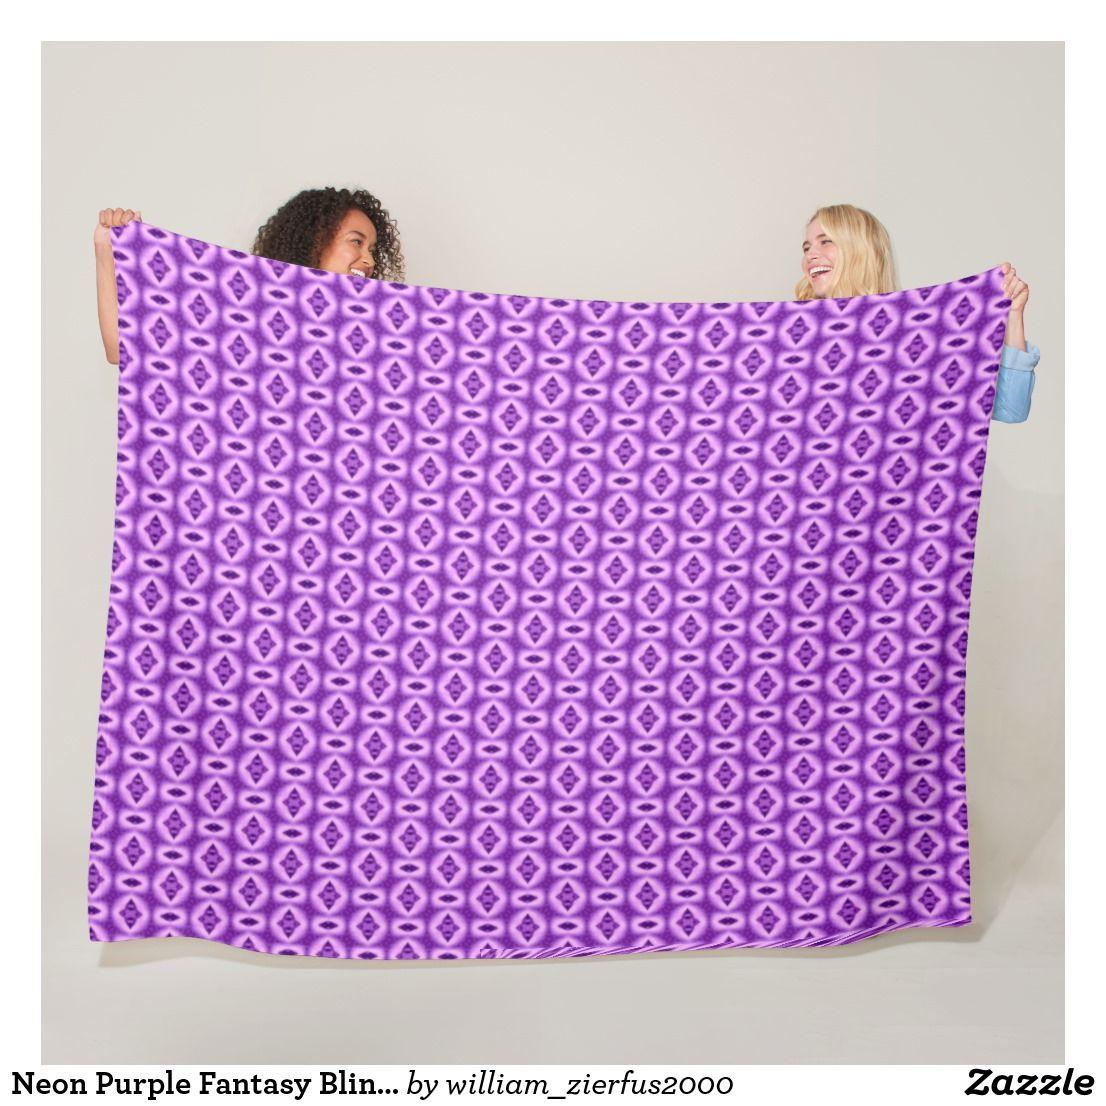 Neon Purple Fantasy Bling Plush Quilt Fleece Blanket   Willy Ware ... be5401076ce